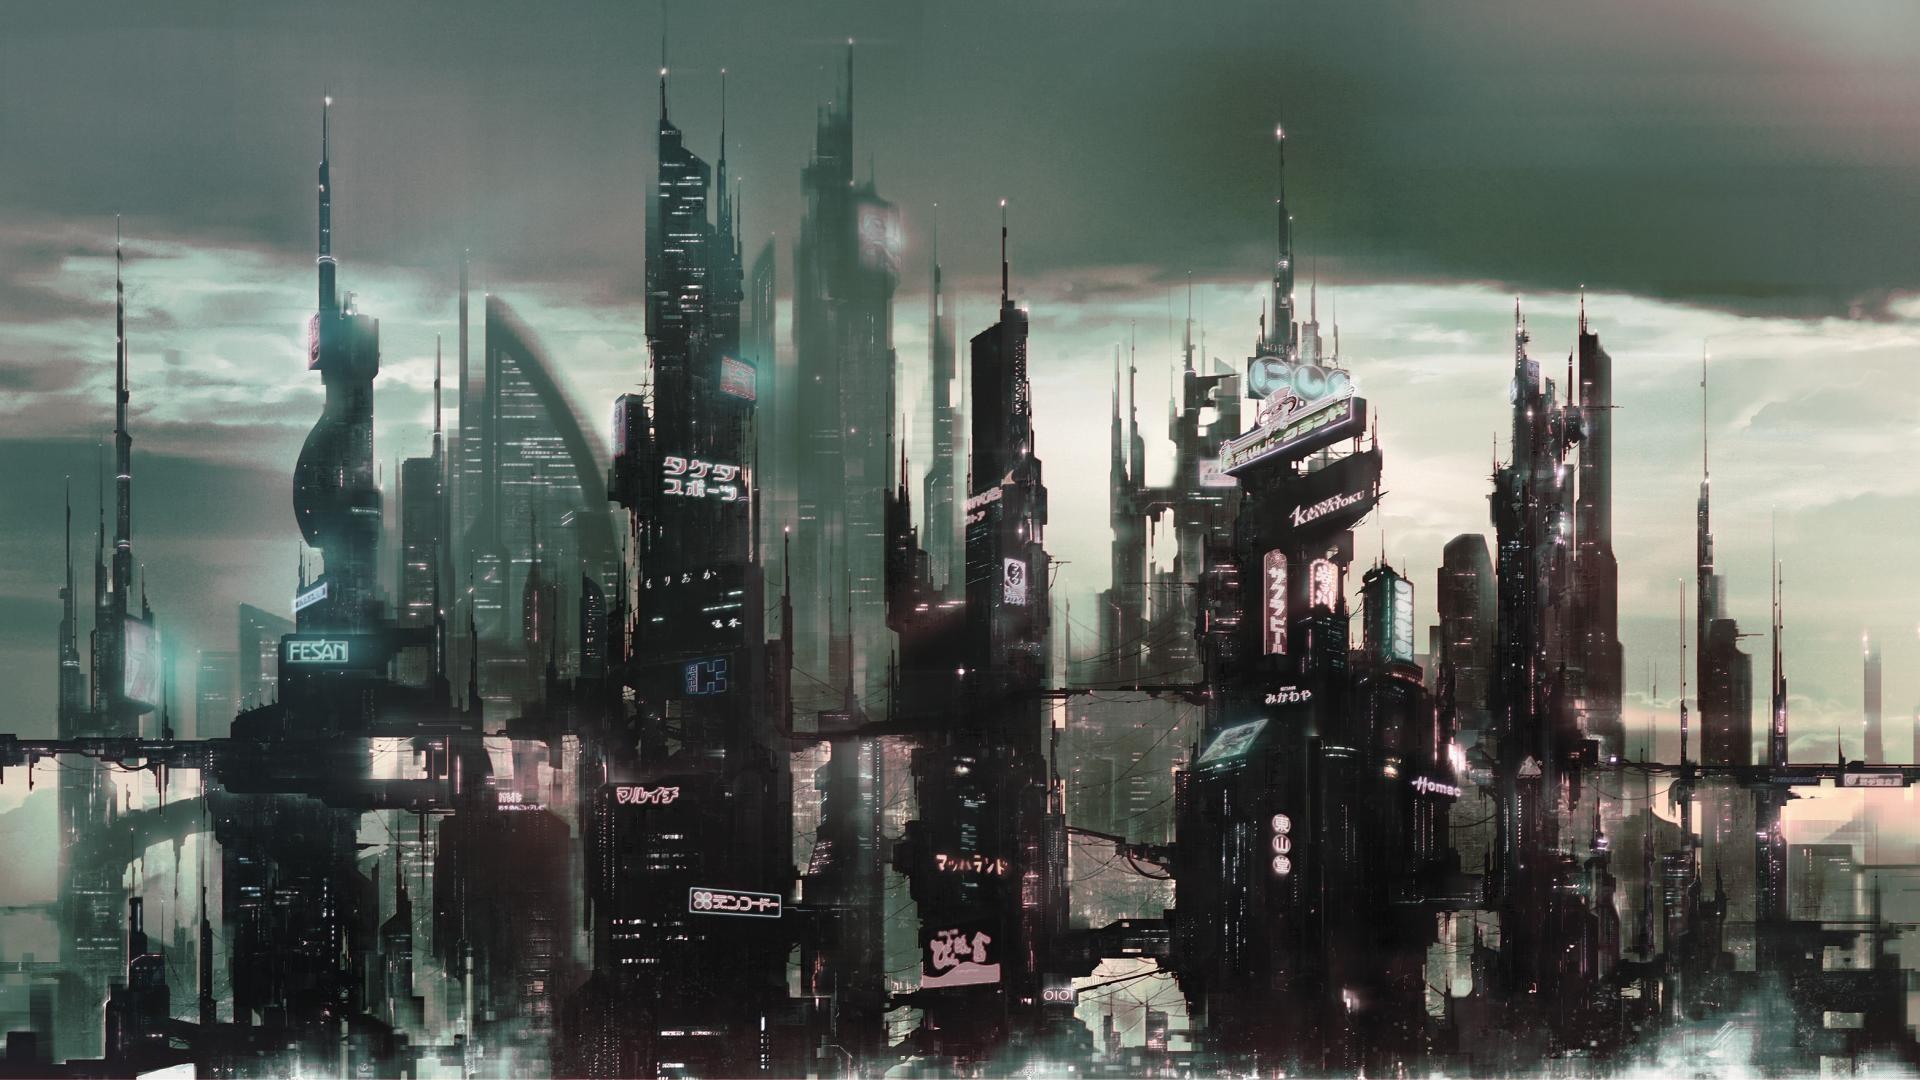 Futuristic City Wallpaper Hd: Blade Runner HD Wallpaper (78+ Images